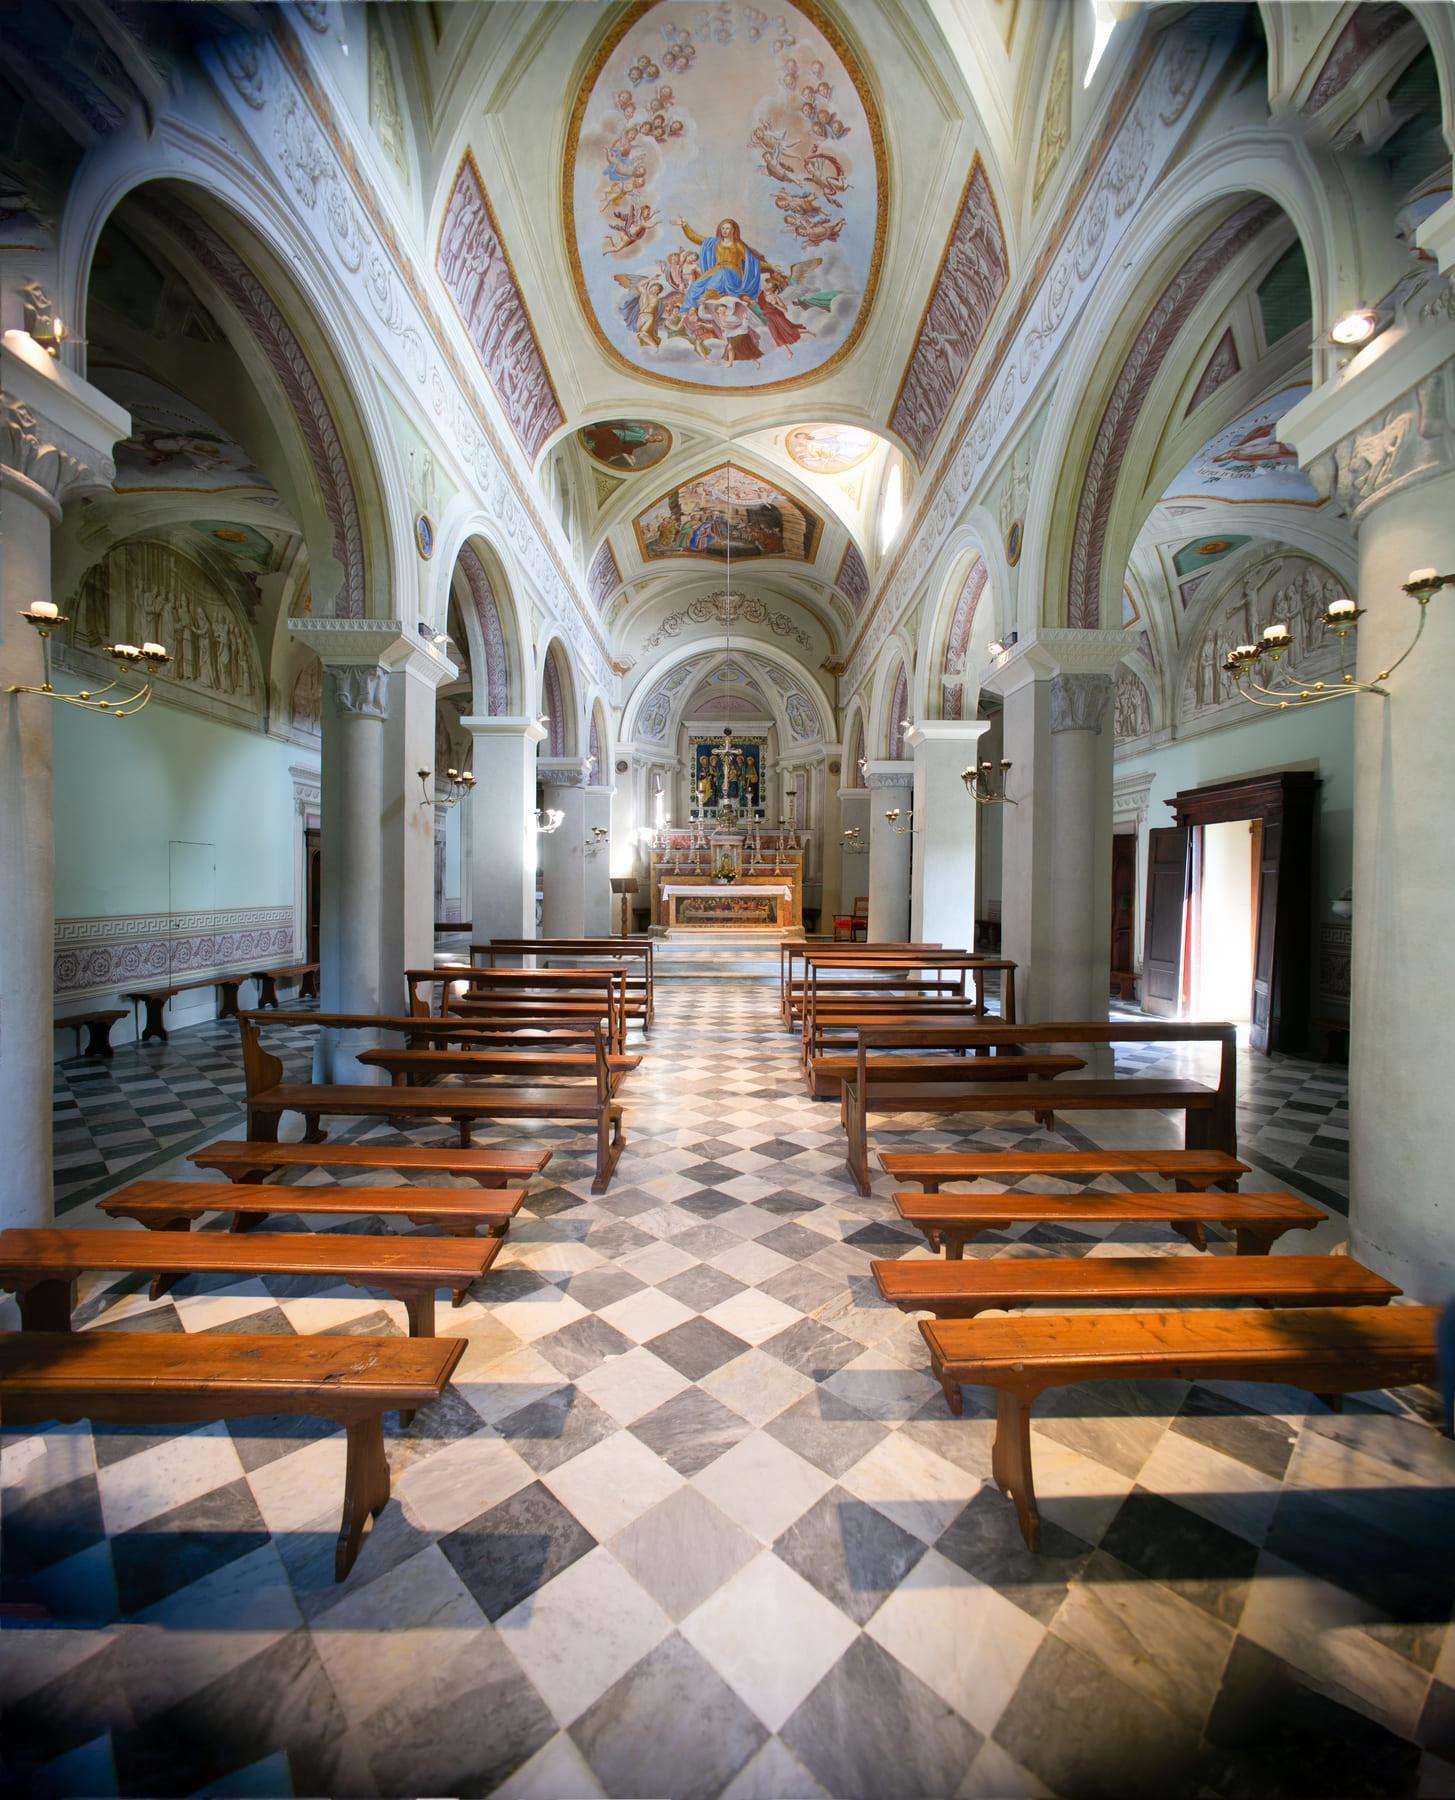 Pieve di Santa Maria Novella: a jewel of Chianti